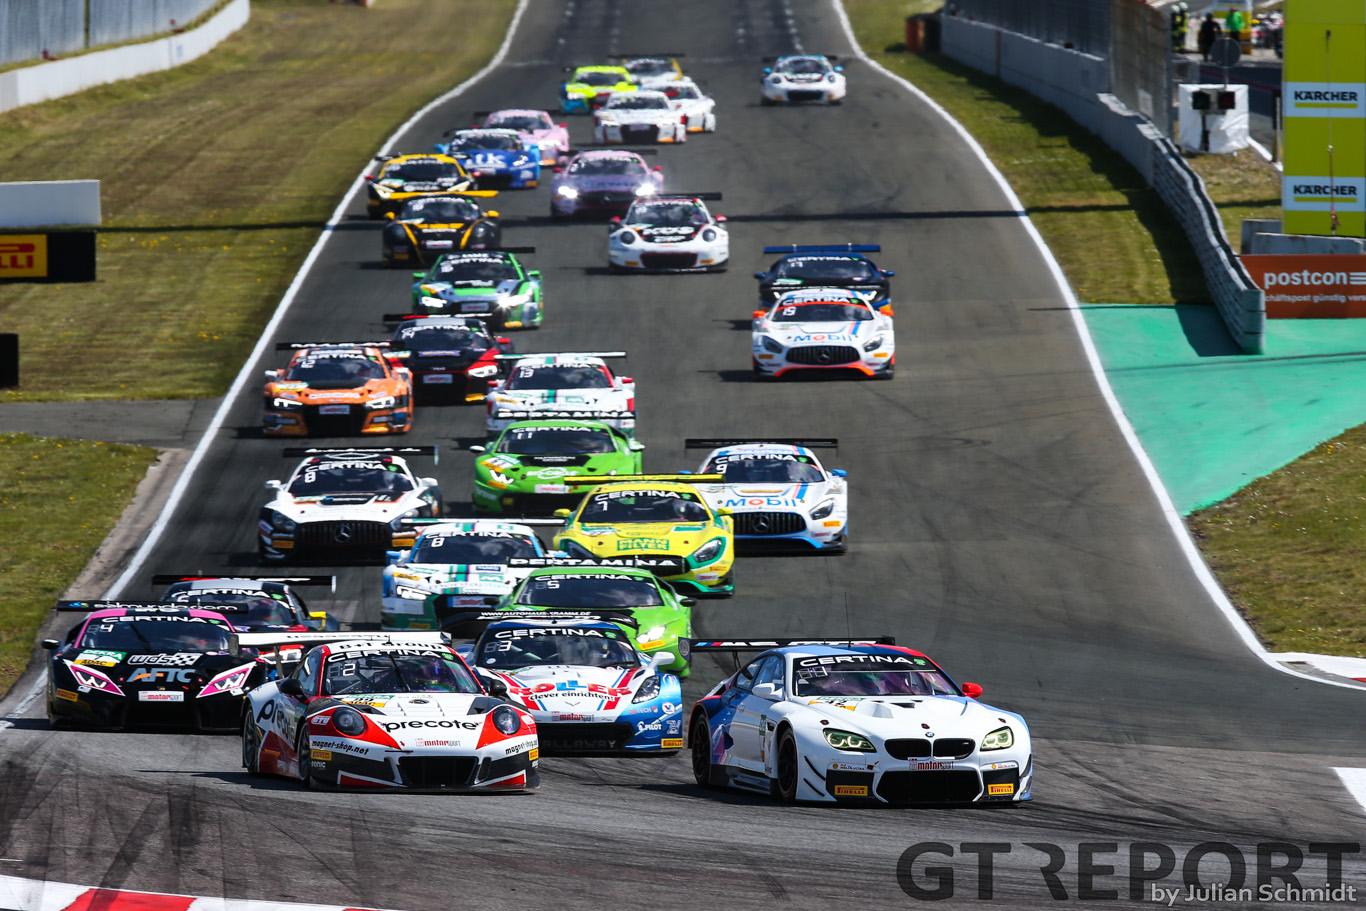 ADAC GT Oschersleben race report: Schnitzer returns